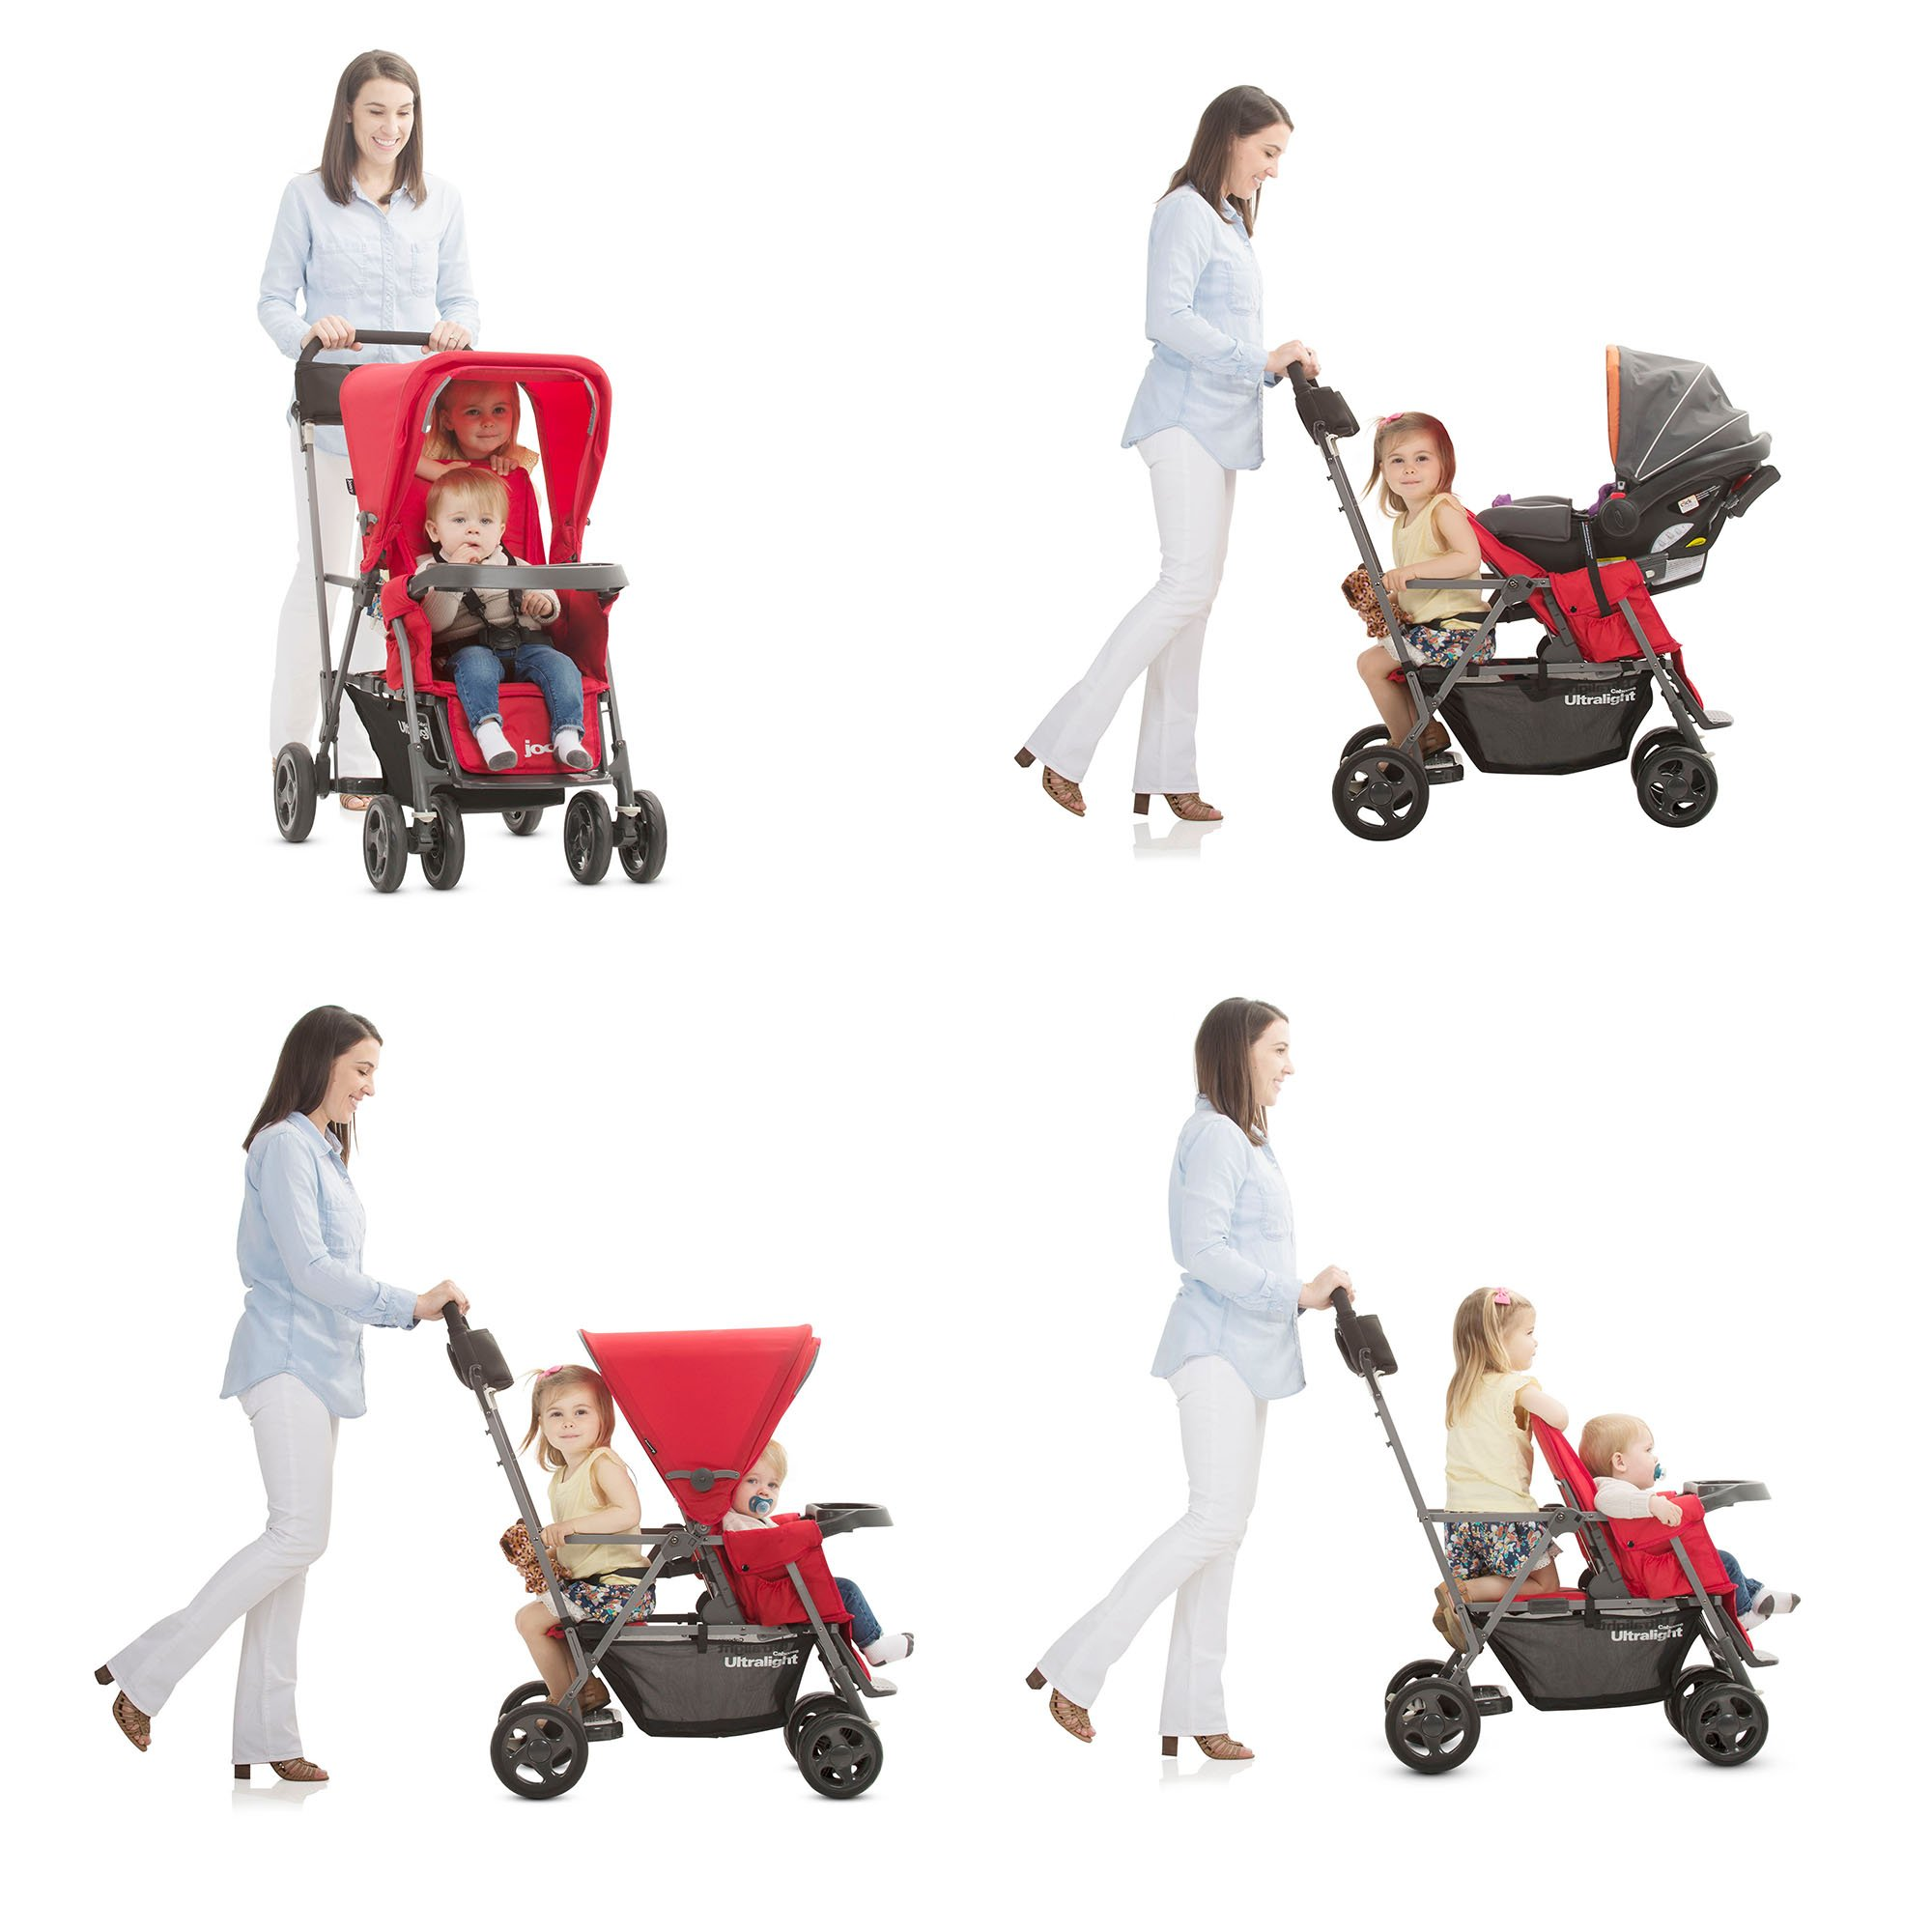 Black JOOVY Caboose Too Graphite Stand-On Tandem Stroller